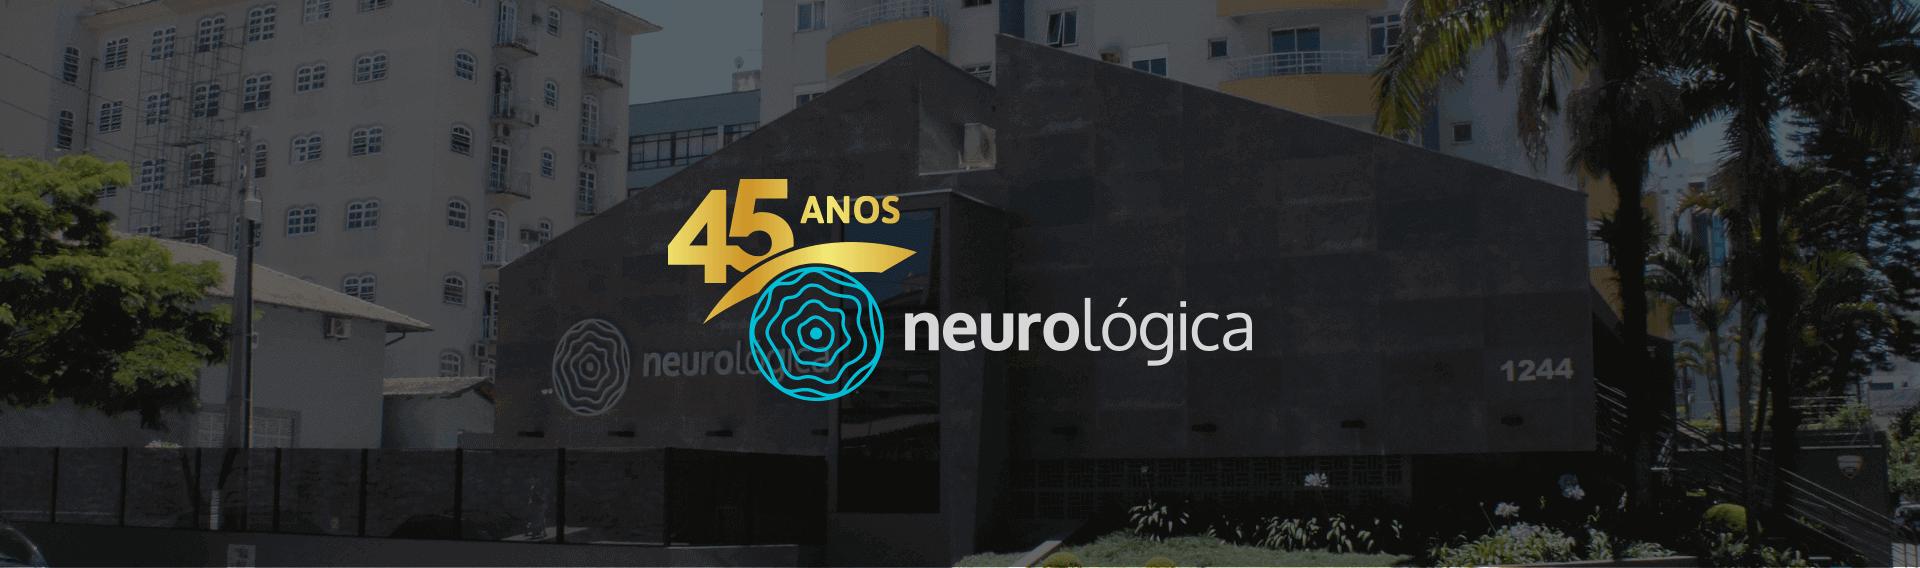 45 Anos Neurológica